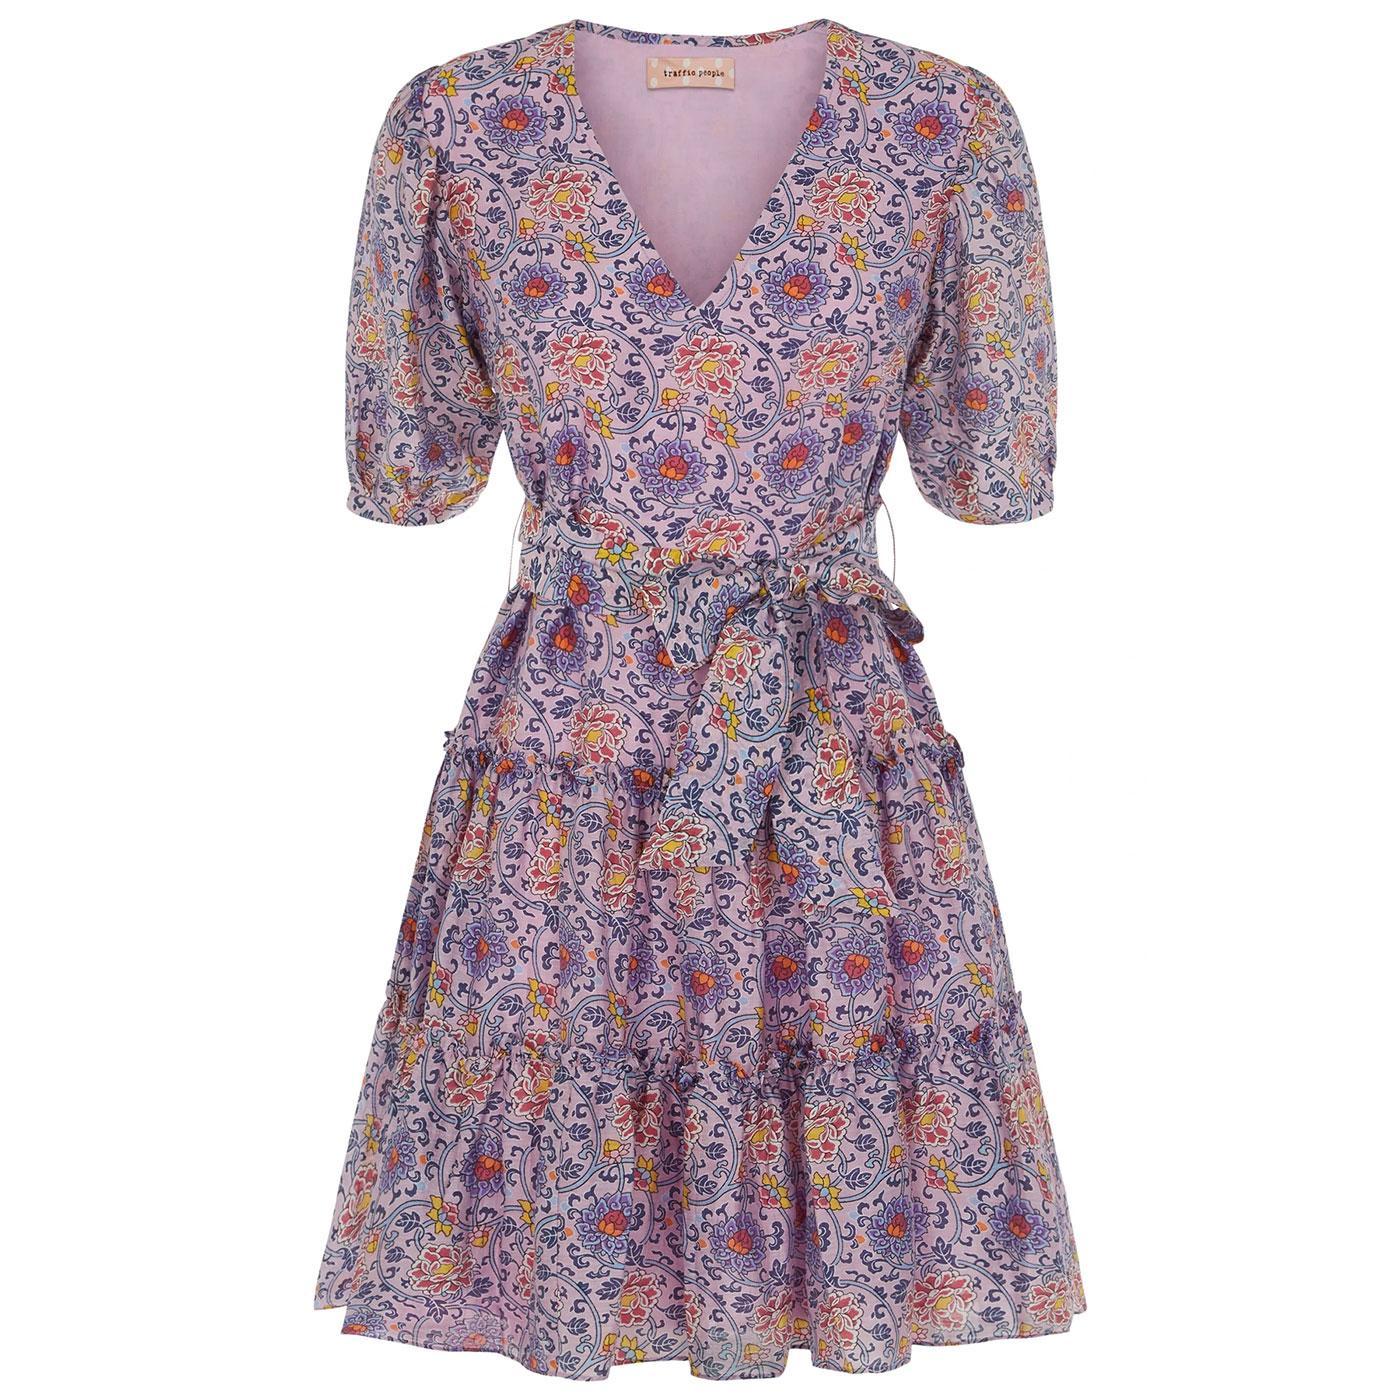 Felicitous TRAFFIC PEOPLE Retro Floral Mini Dress